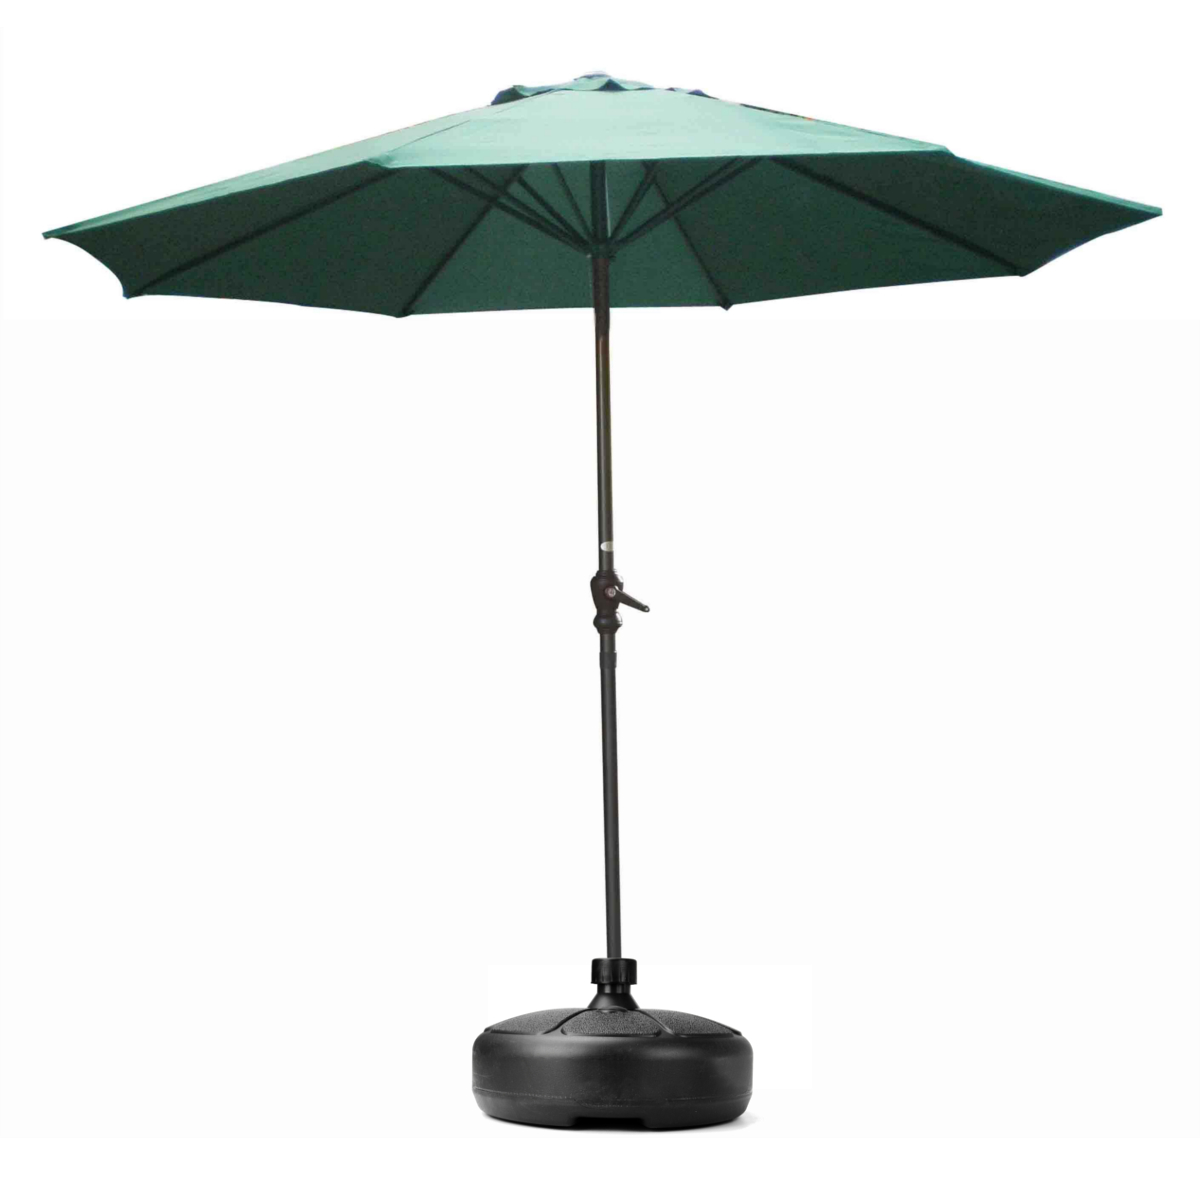 Outdoor Furniture Parasol Garden Umbrella Stand Patio